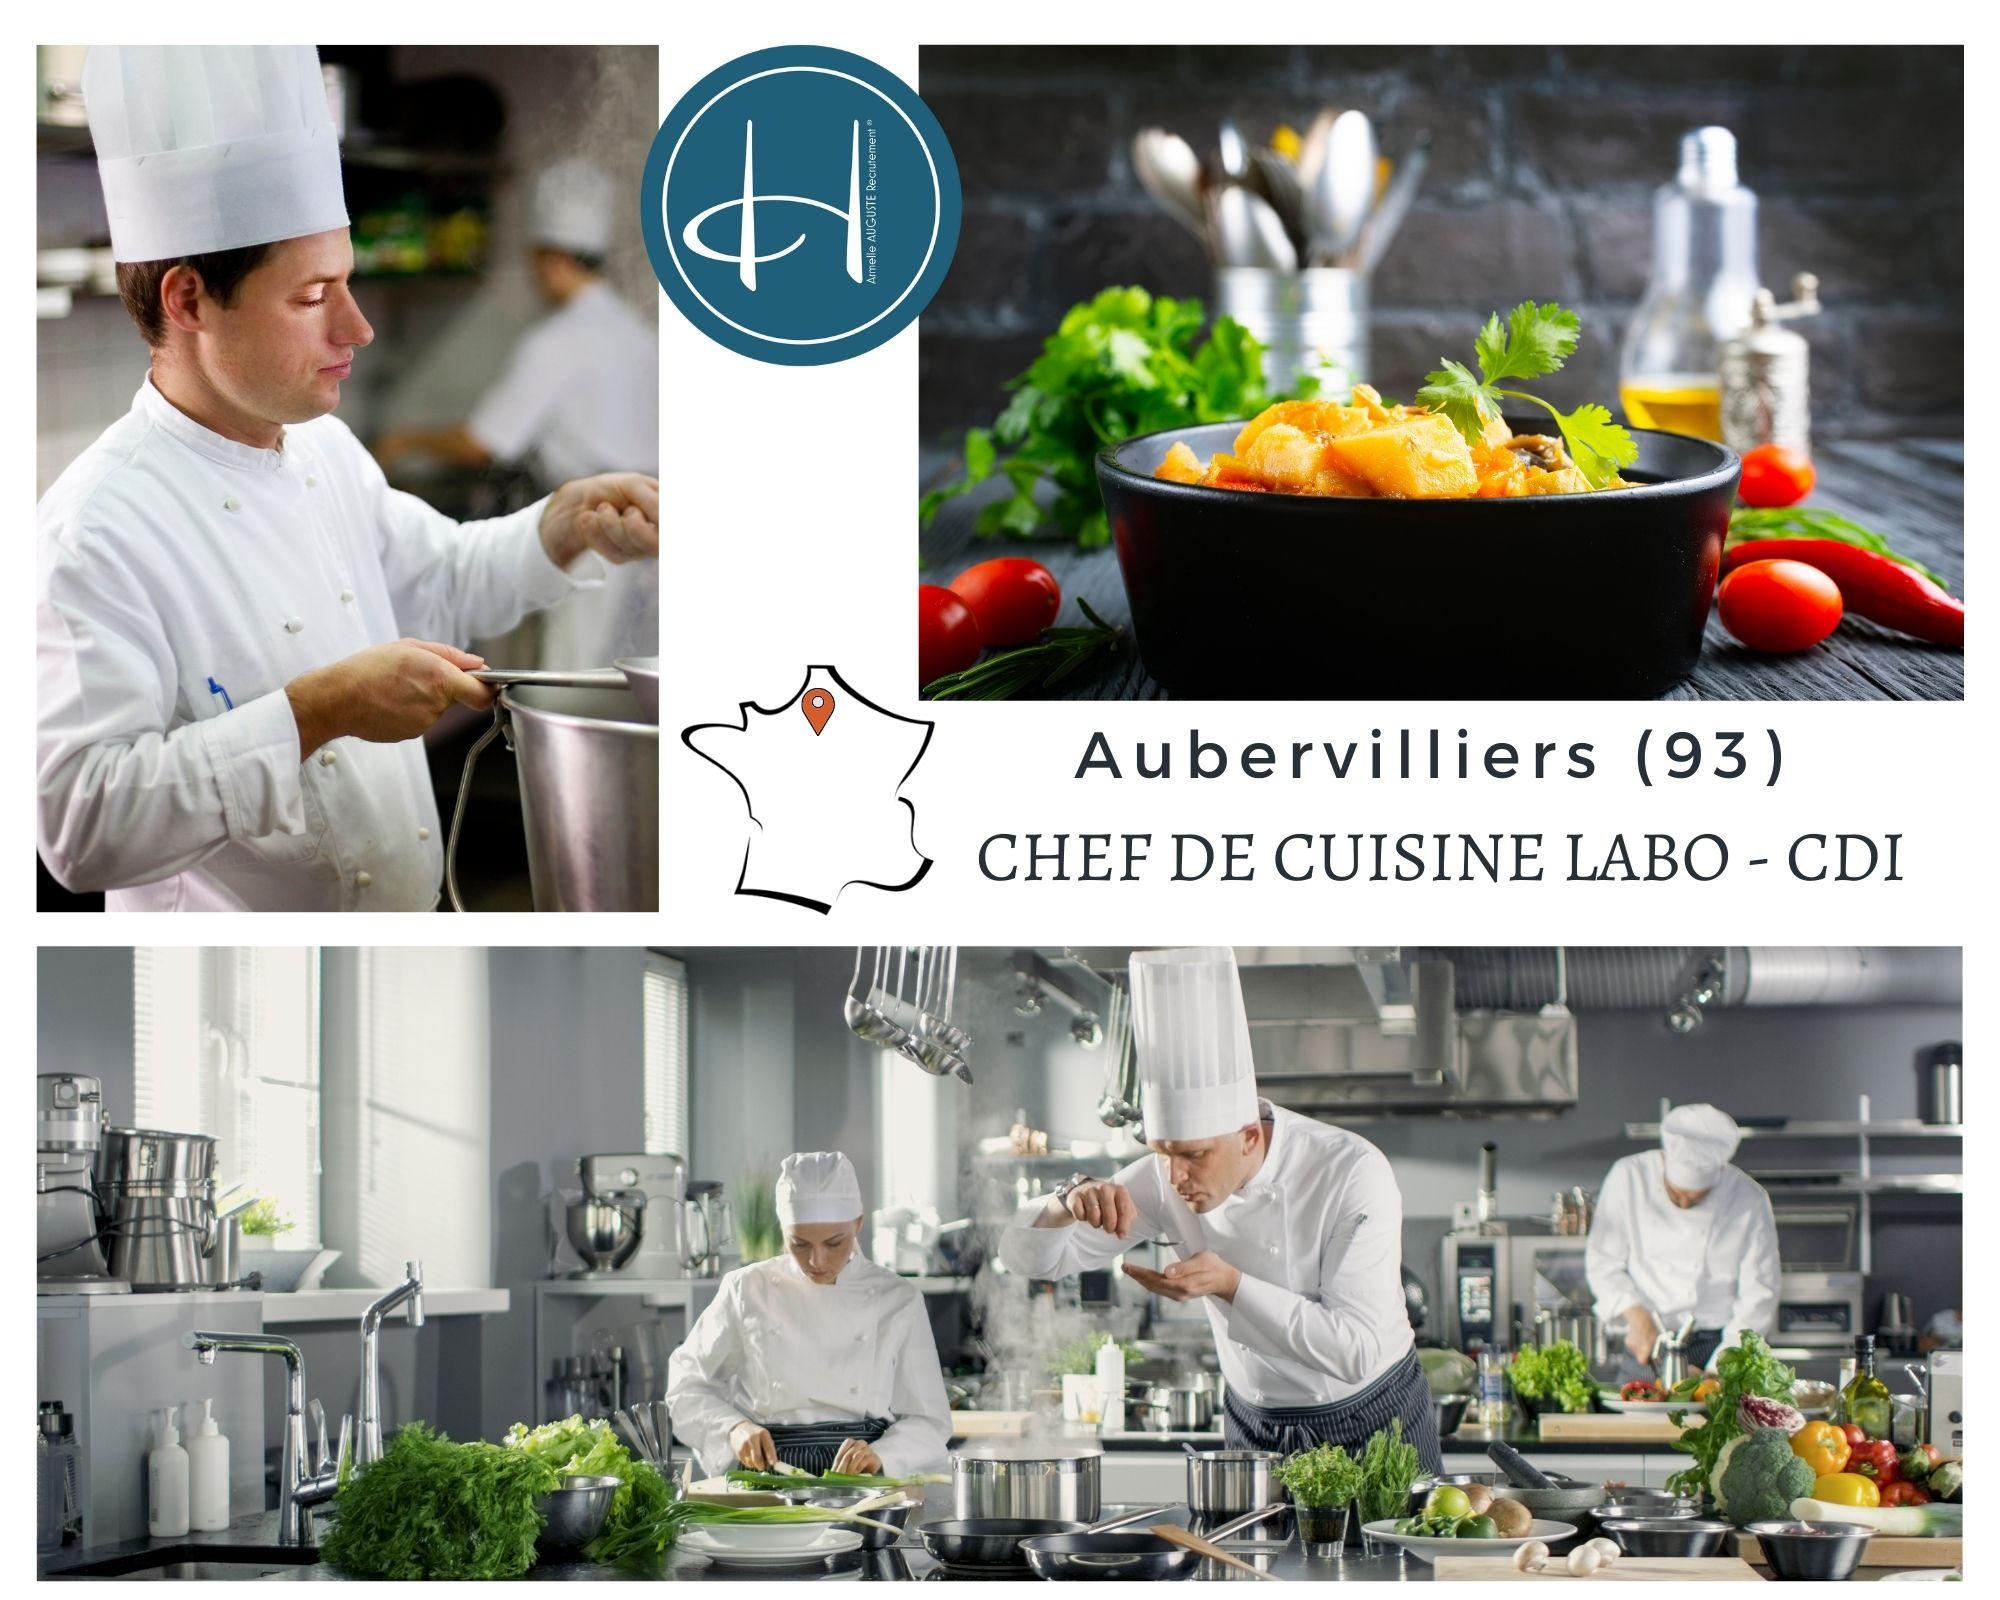 Recrutement: Chef de cuisine F/H chez Armelle AUGUSTE Recrutement® à Aubervilliers